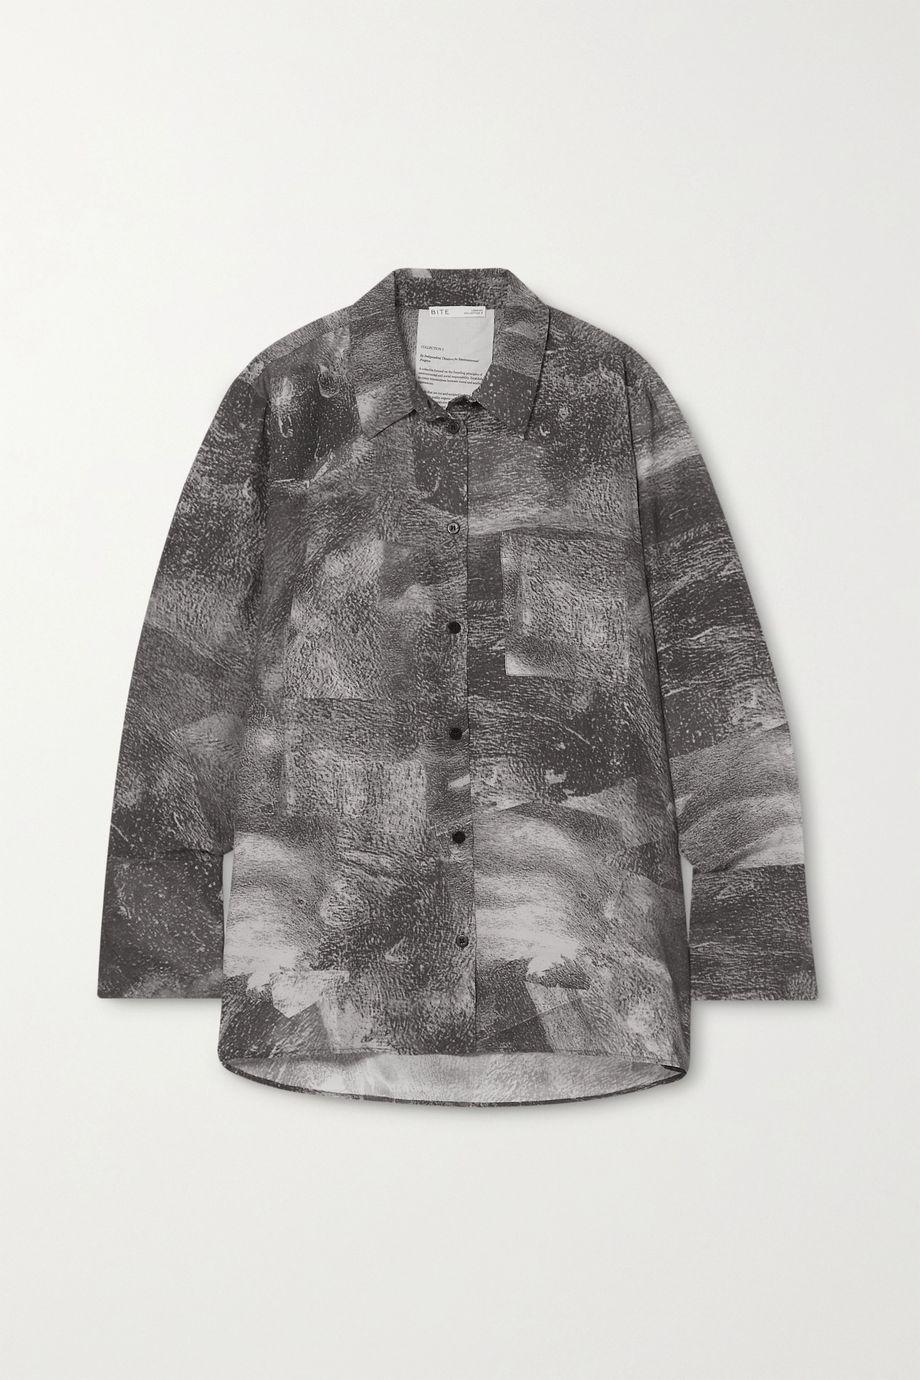 BITE Studios + NET SUSTAIN printed organic silk crepe de chine shirt